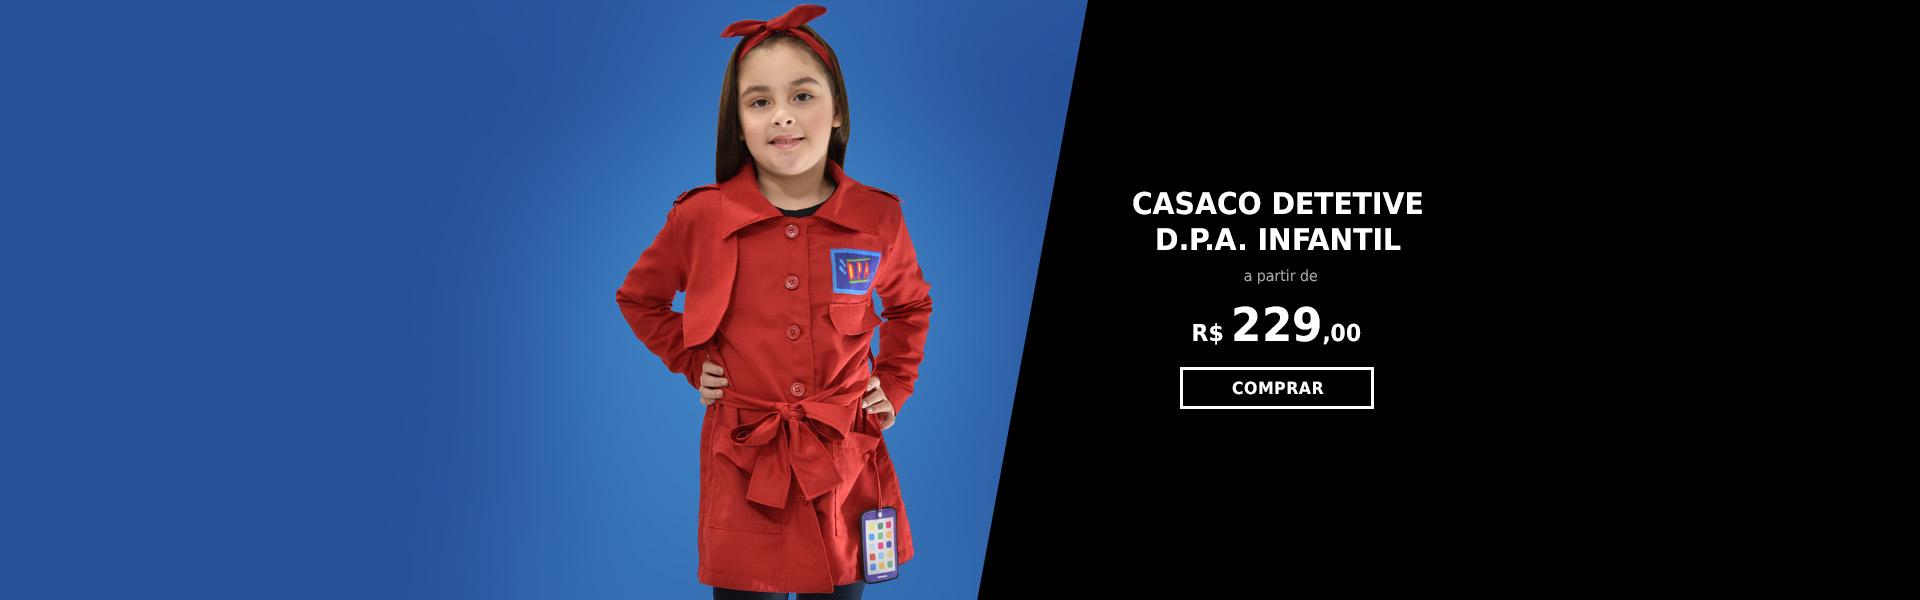 Casaco Detetive DPA Infantil